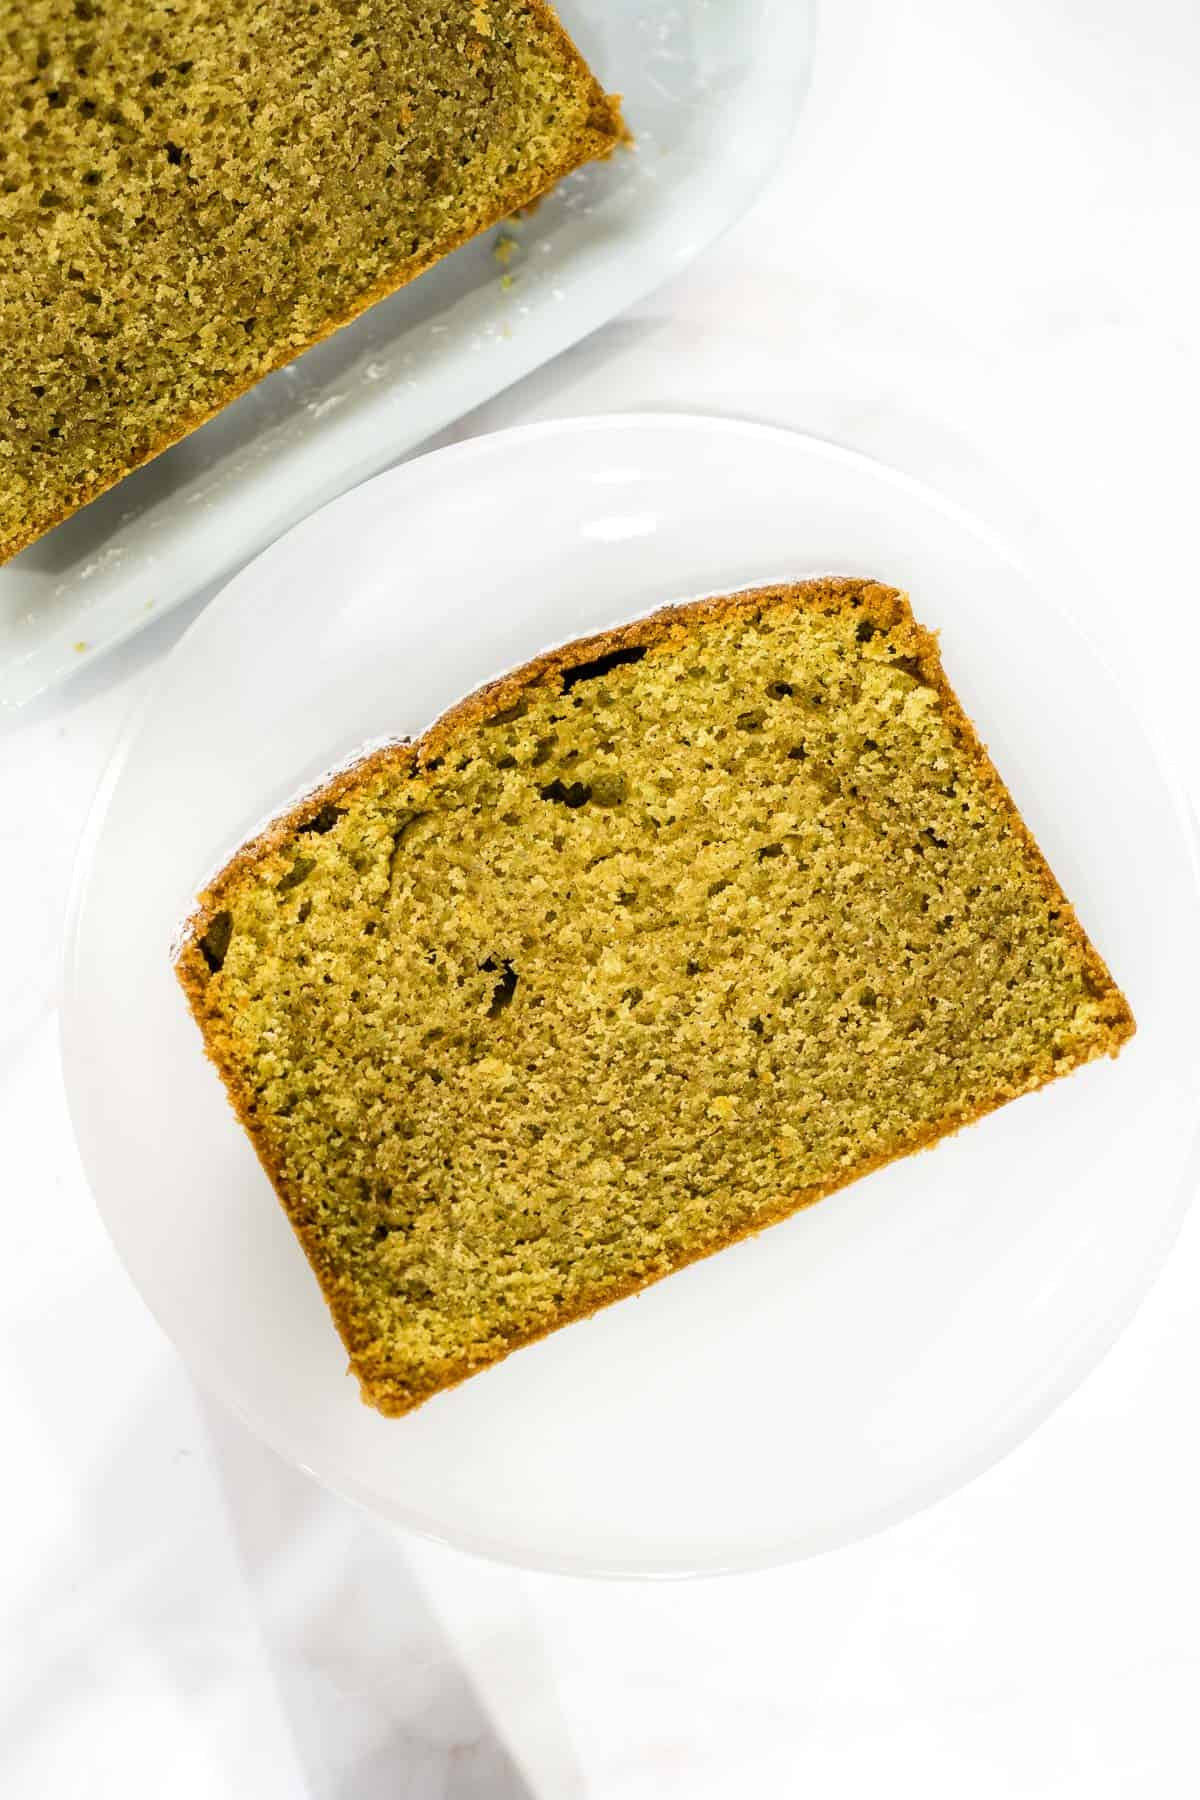 A slice of matcha pound cake on a white plate